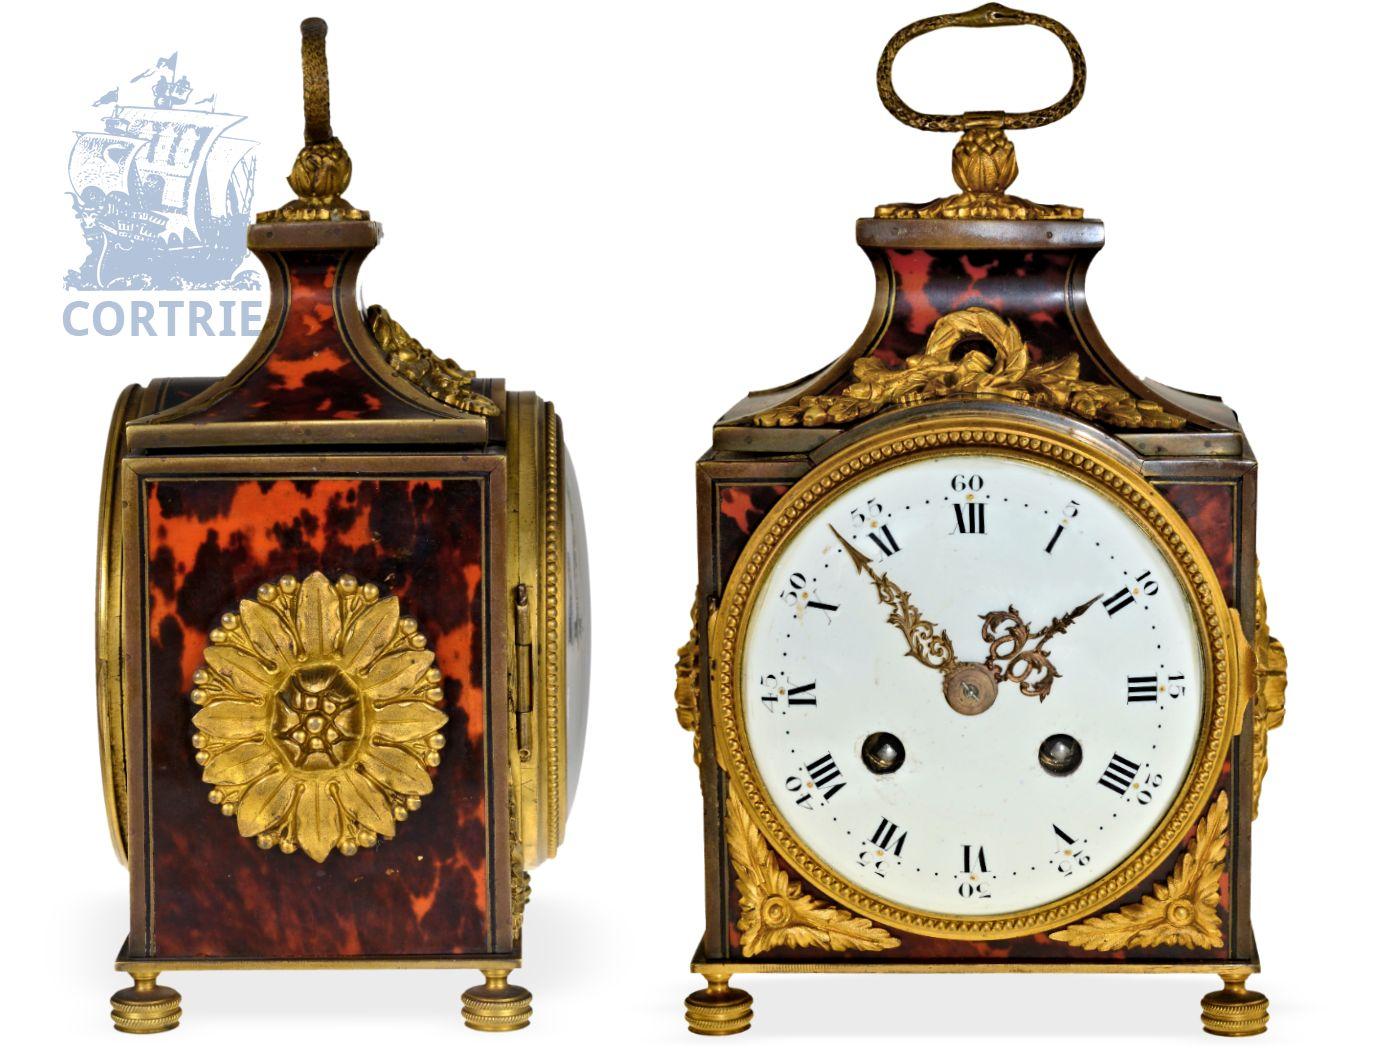 Travel clock: decorative officer's travel clock with tortoiseshell/bronze case, striking train, probably France ca. 1860-